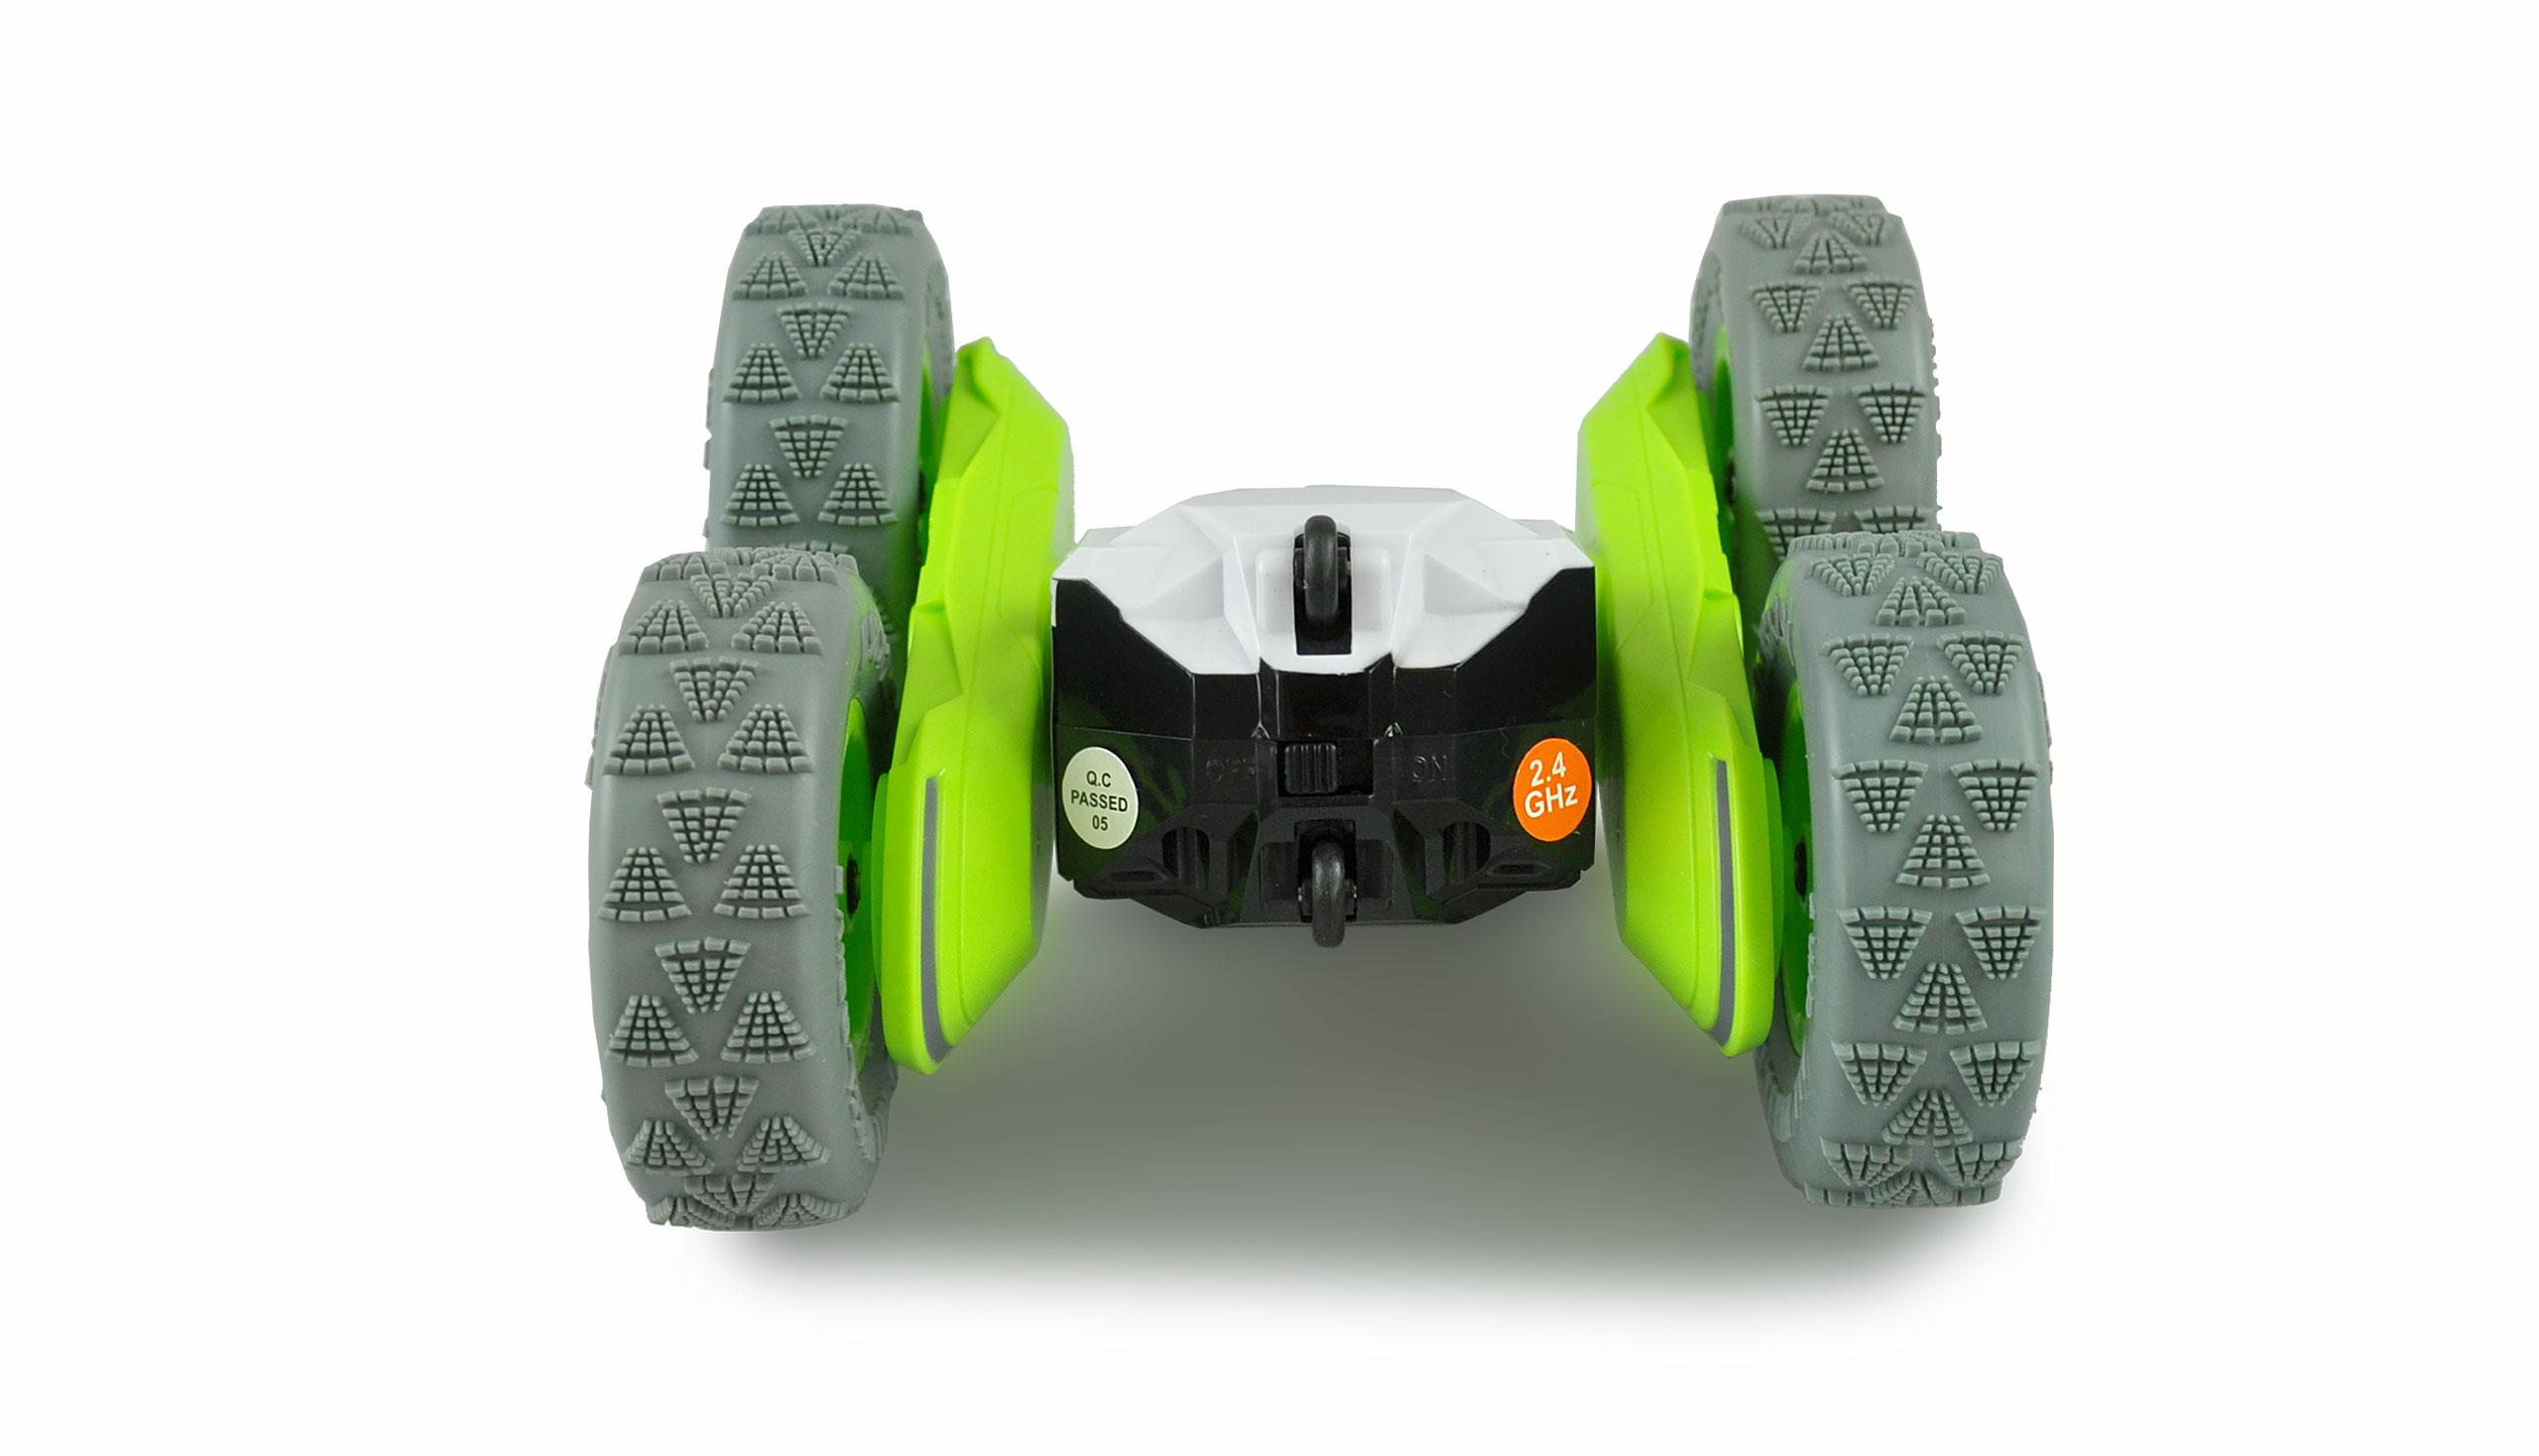 Amewi Big Spinstar Stuntfahrzeug - Stuntauto - 1:24 - Junge - 6 Jahr(e) - 700 mAh - 385 g